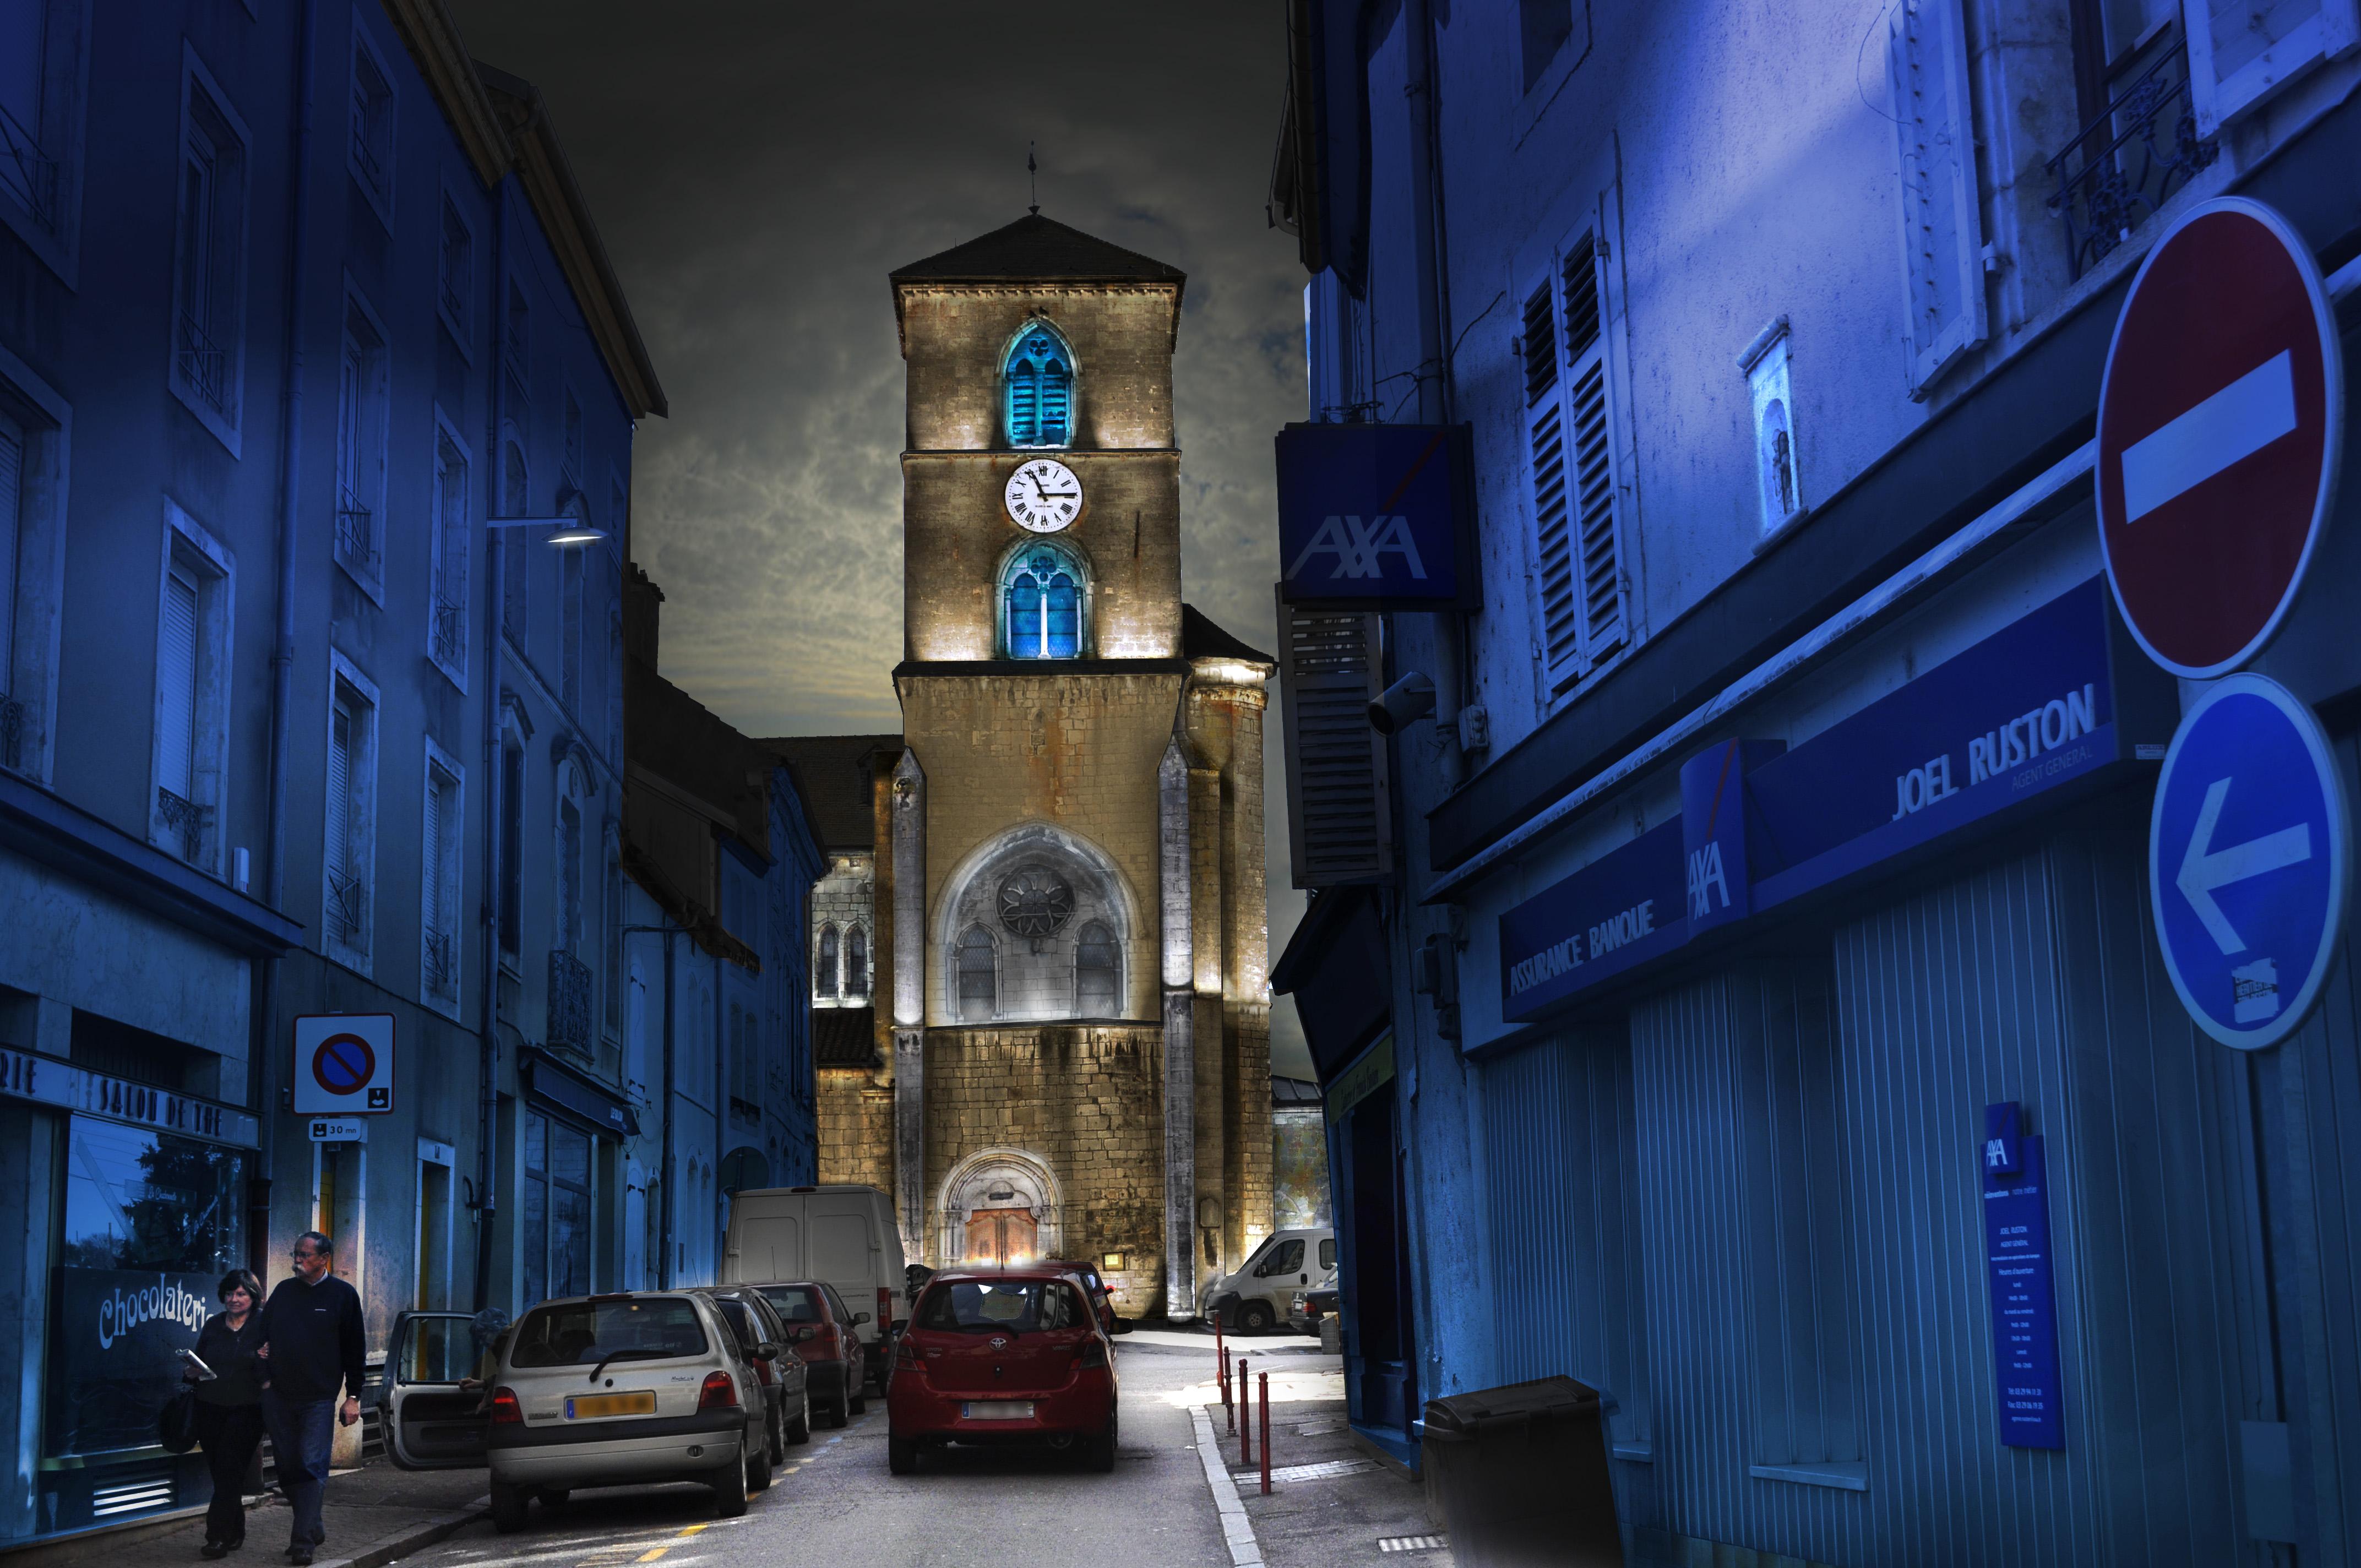 MEV_Eglise Saint-Christophe